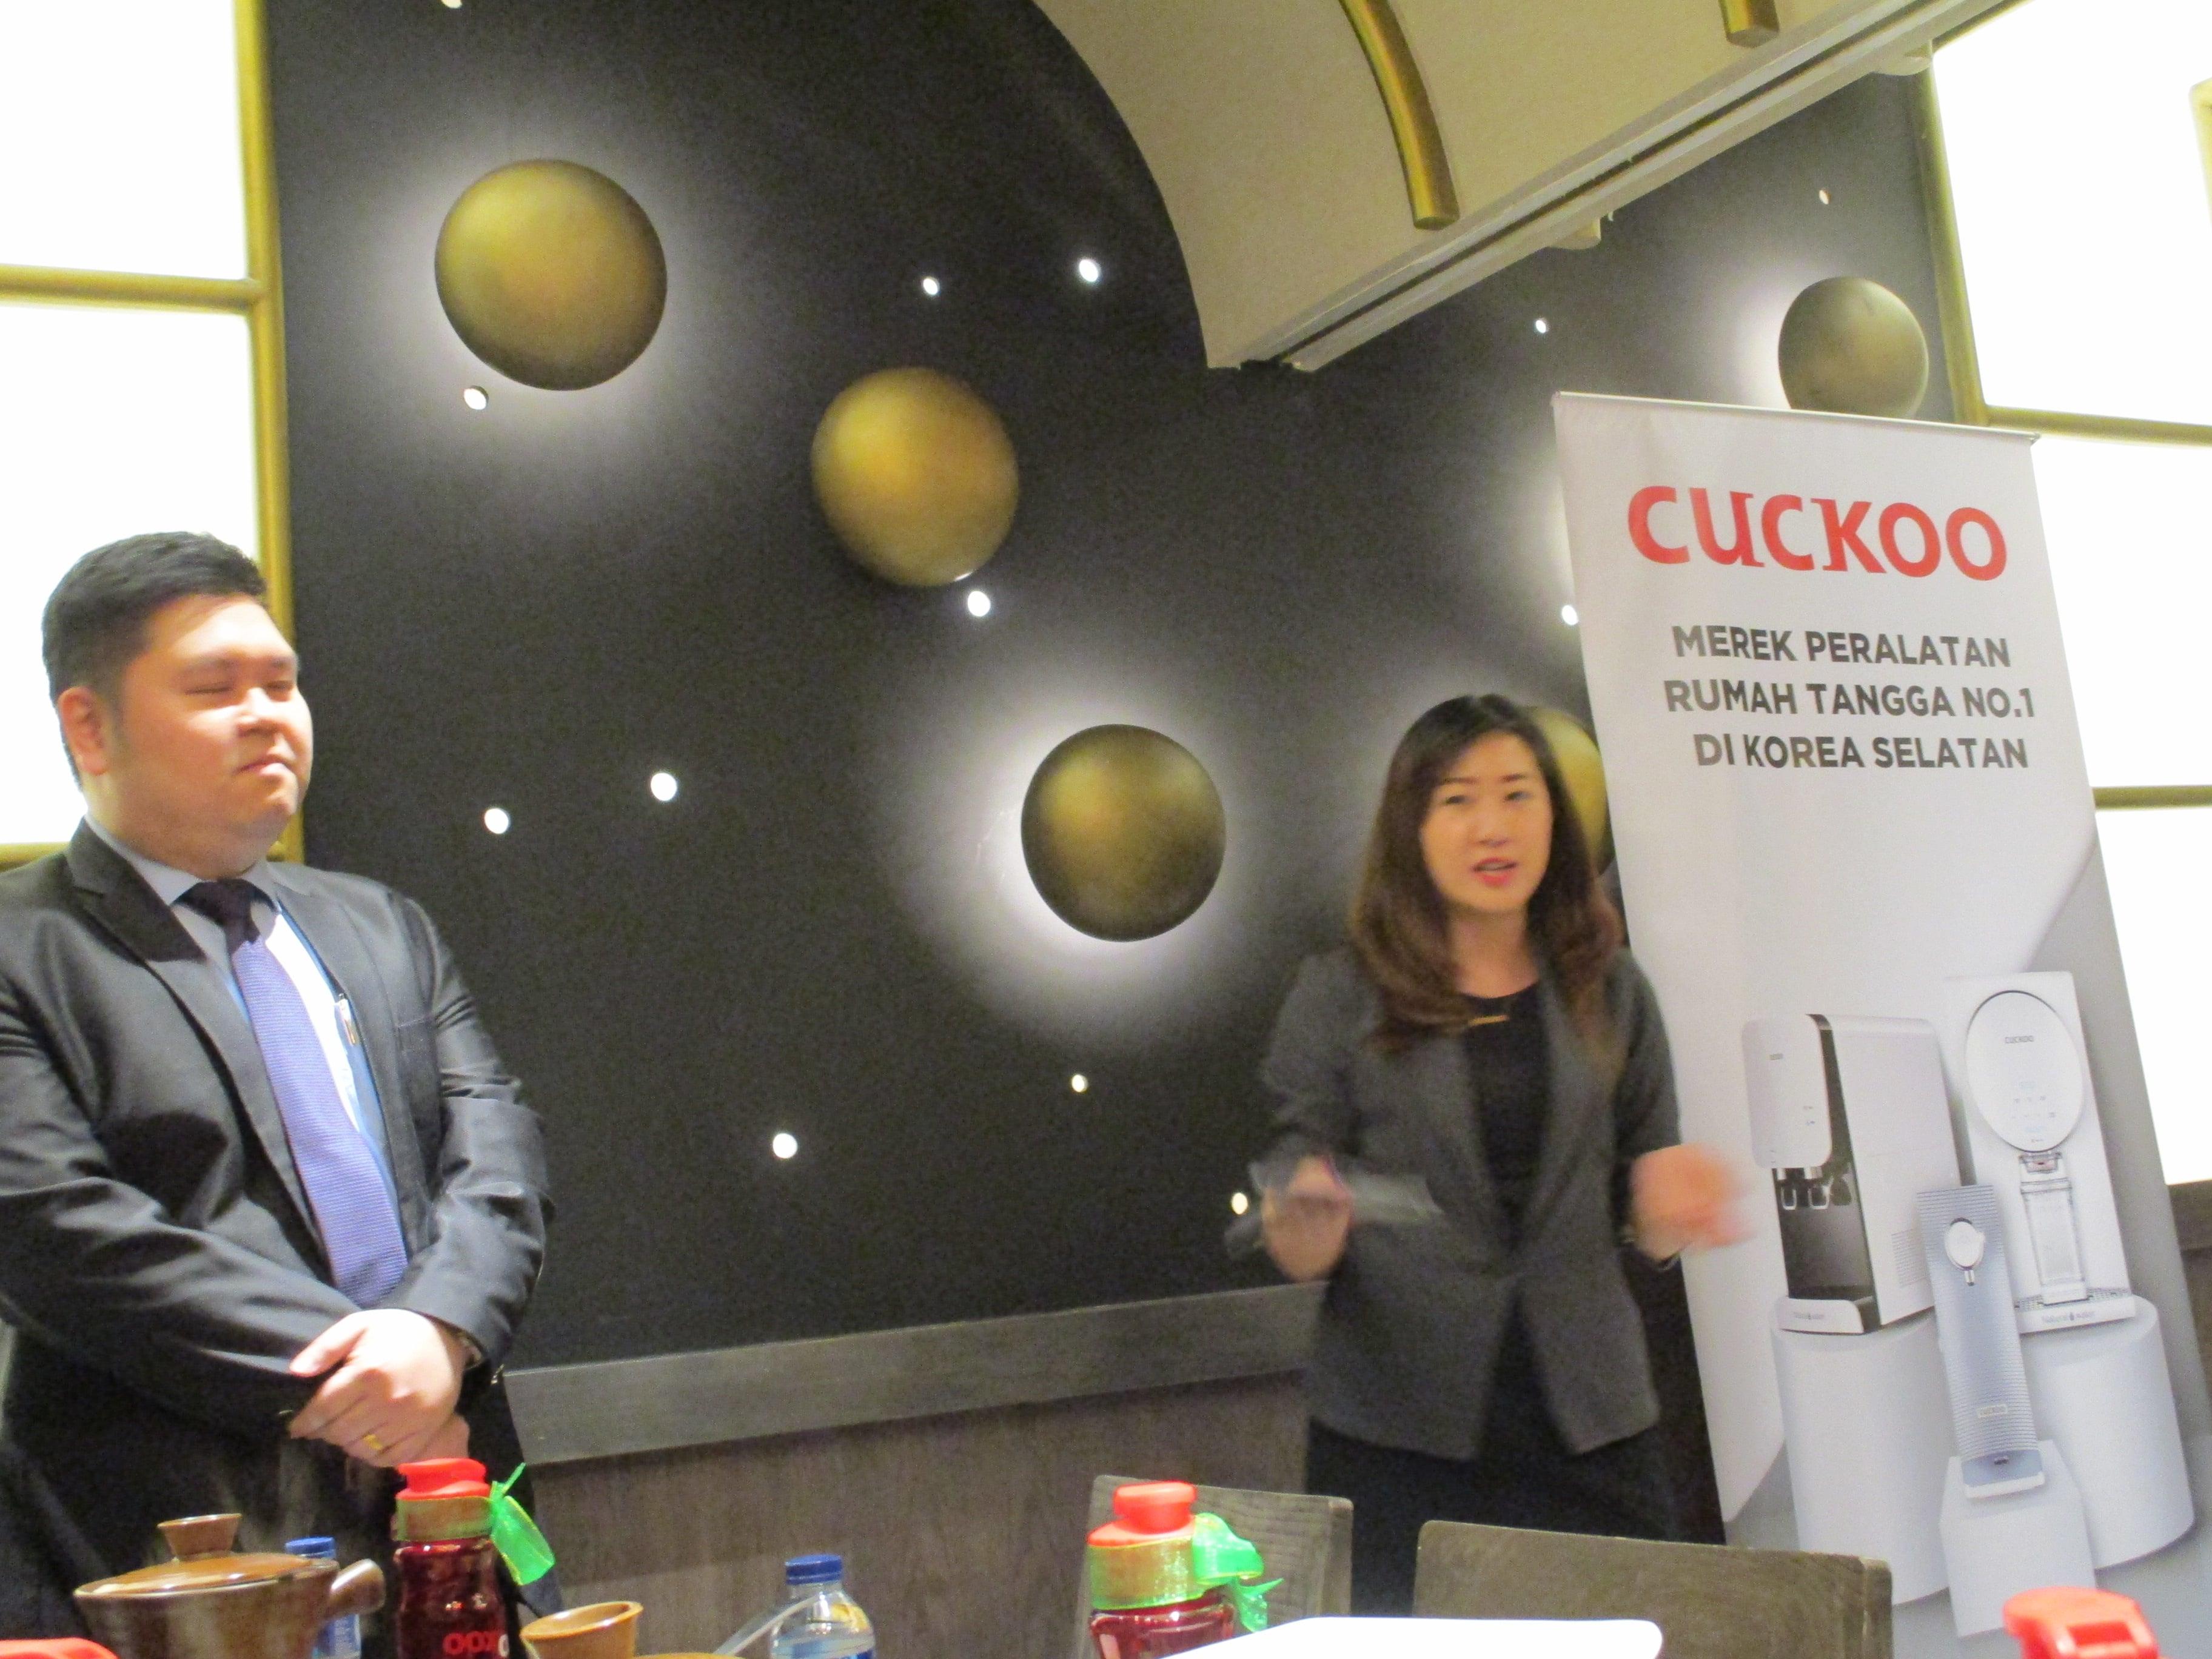 Cuckoo Media Friends